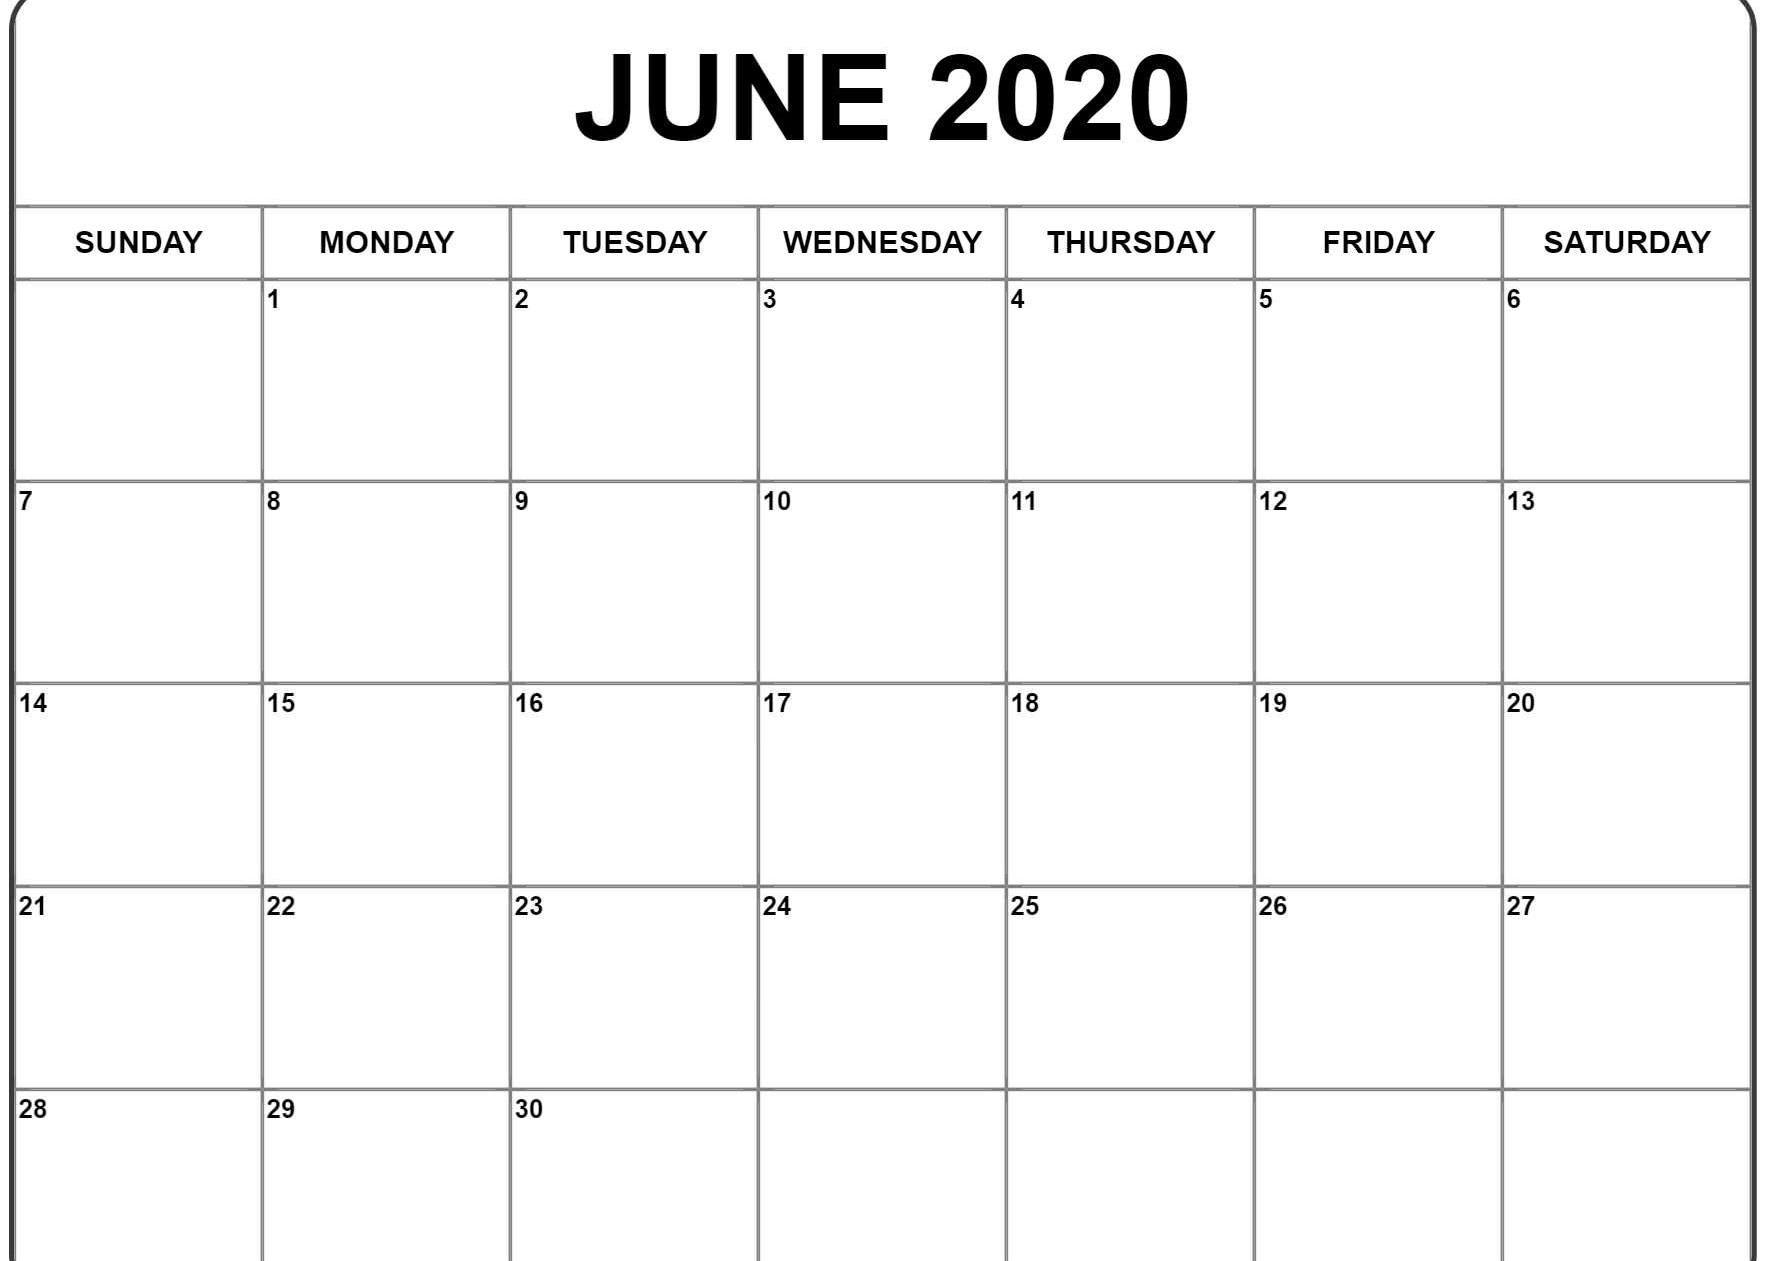 June 2020 Calendar | Printable Calendar Template, Monthly